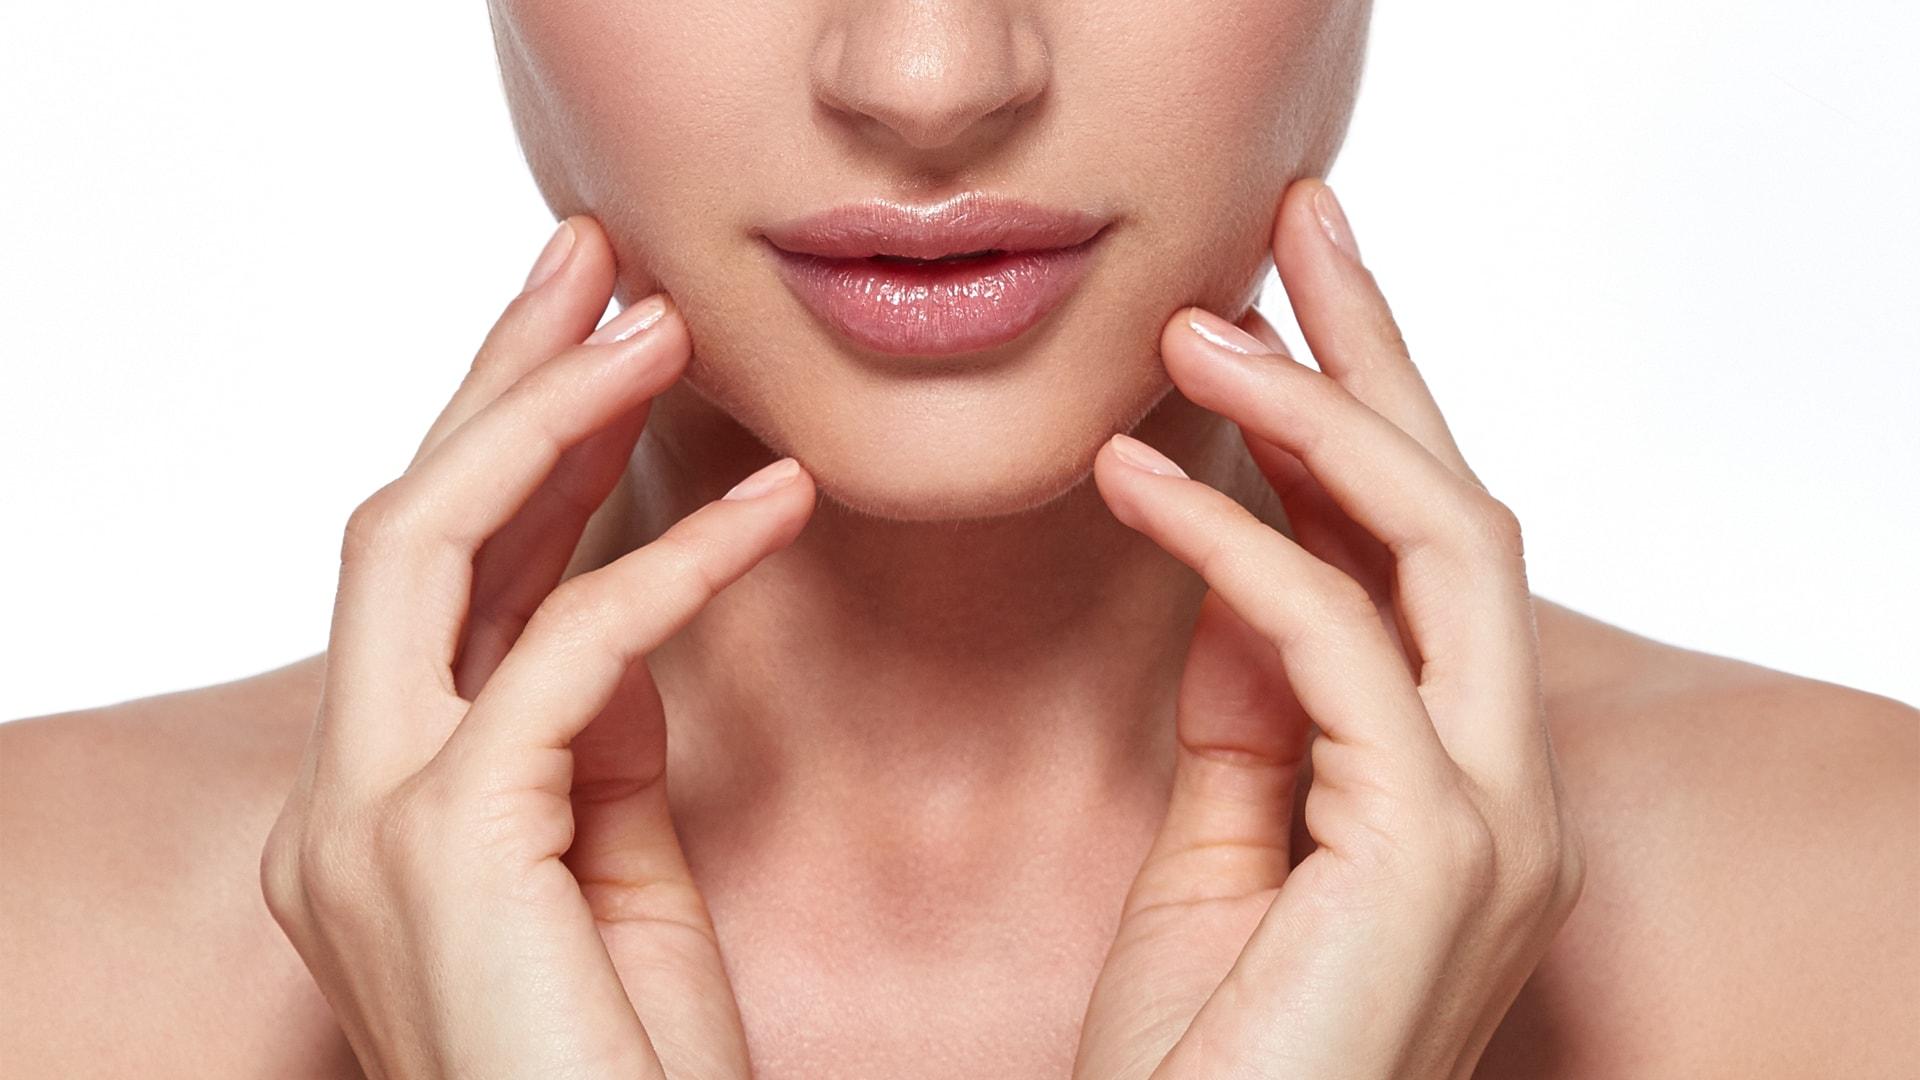 Chin and Cheek Implants